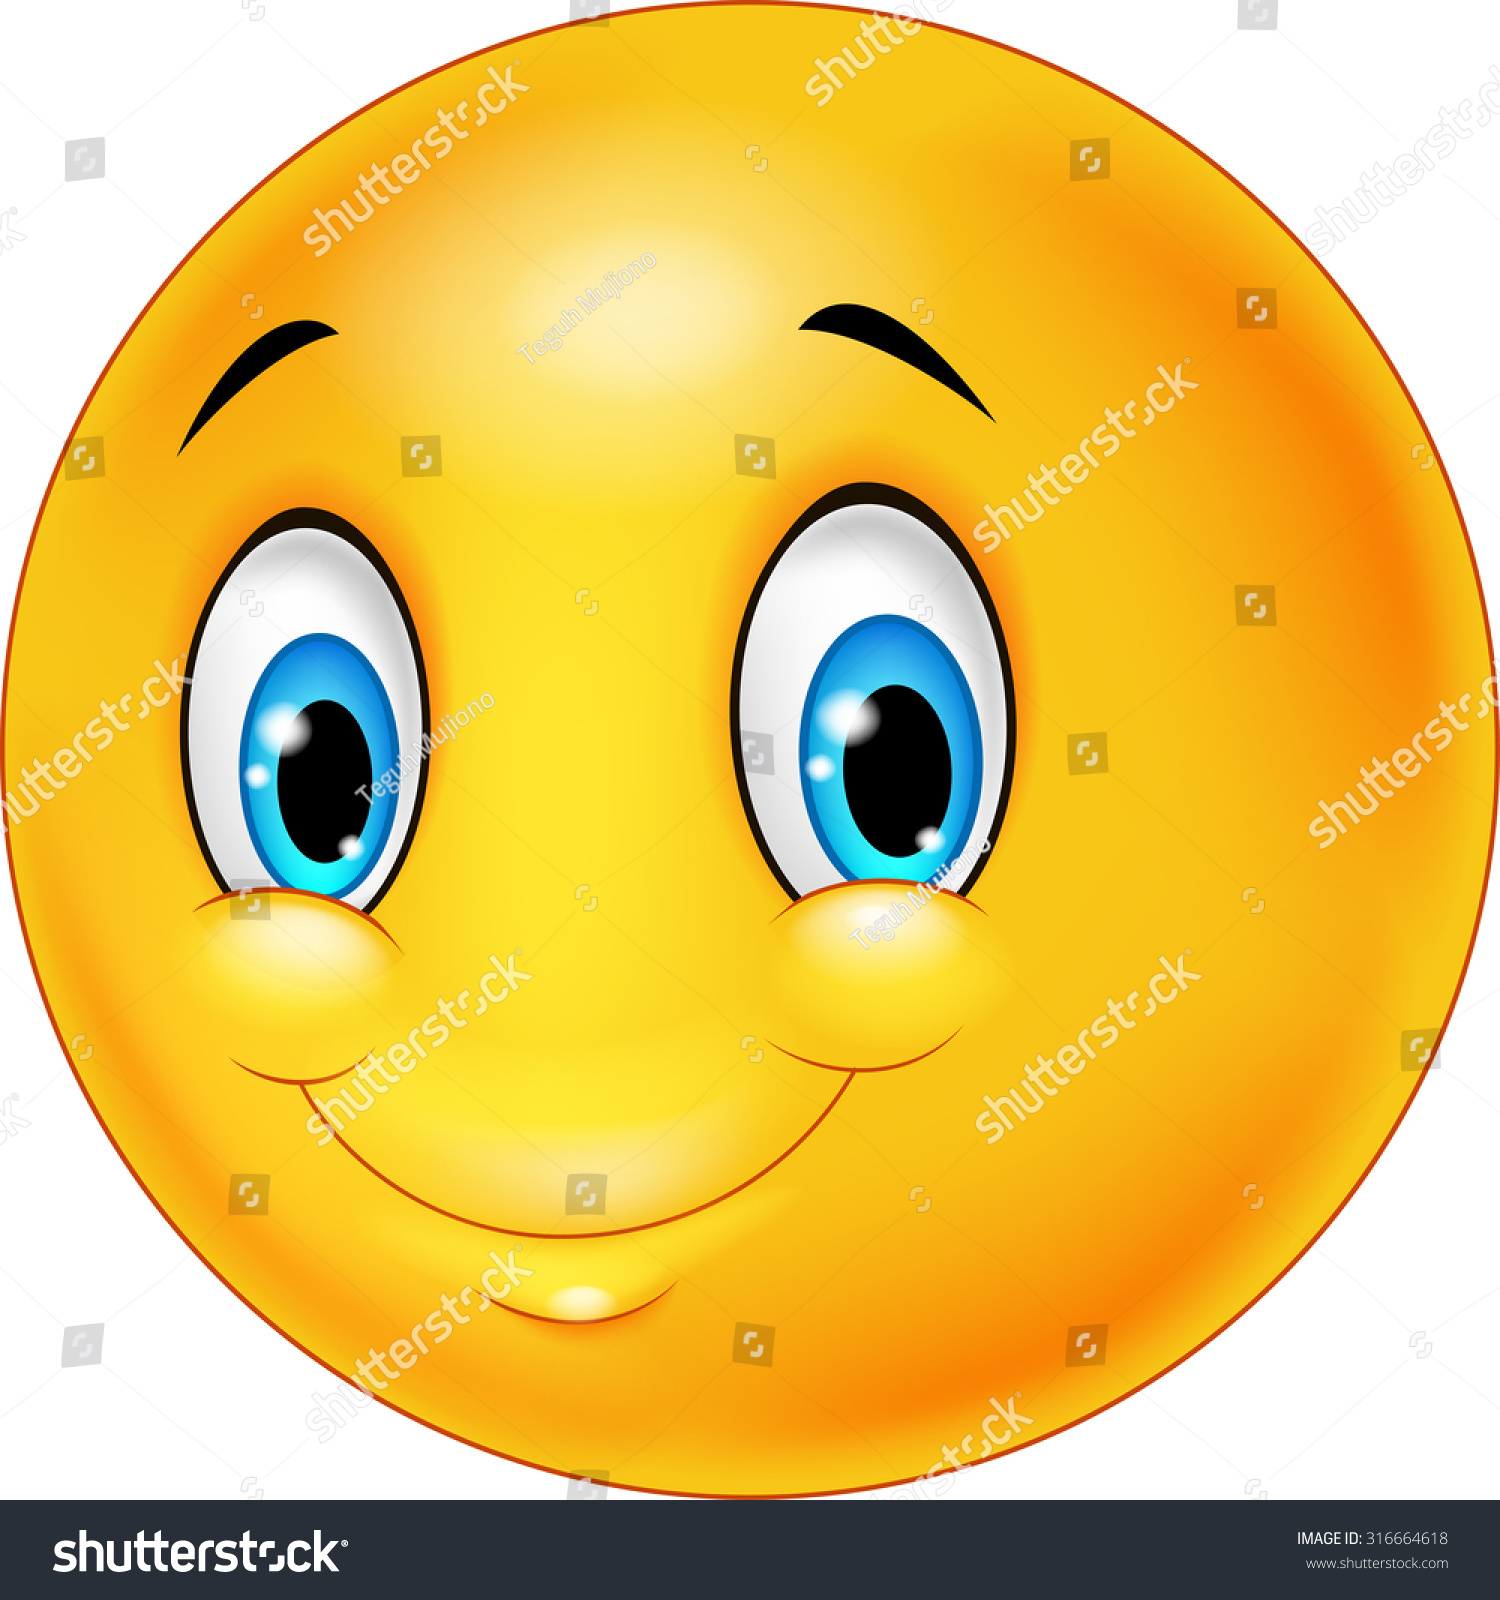 Cartoon emoticon smile on transparent background stock cartoon emoticon smile on transparent background buycottarizona Choice Image